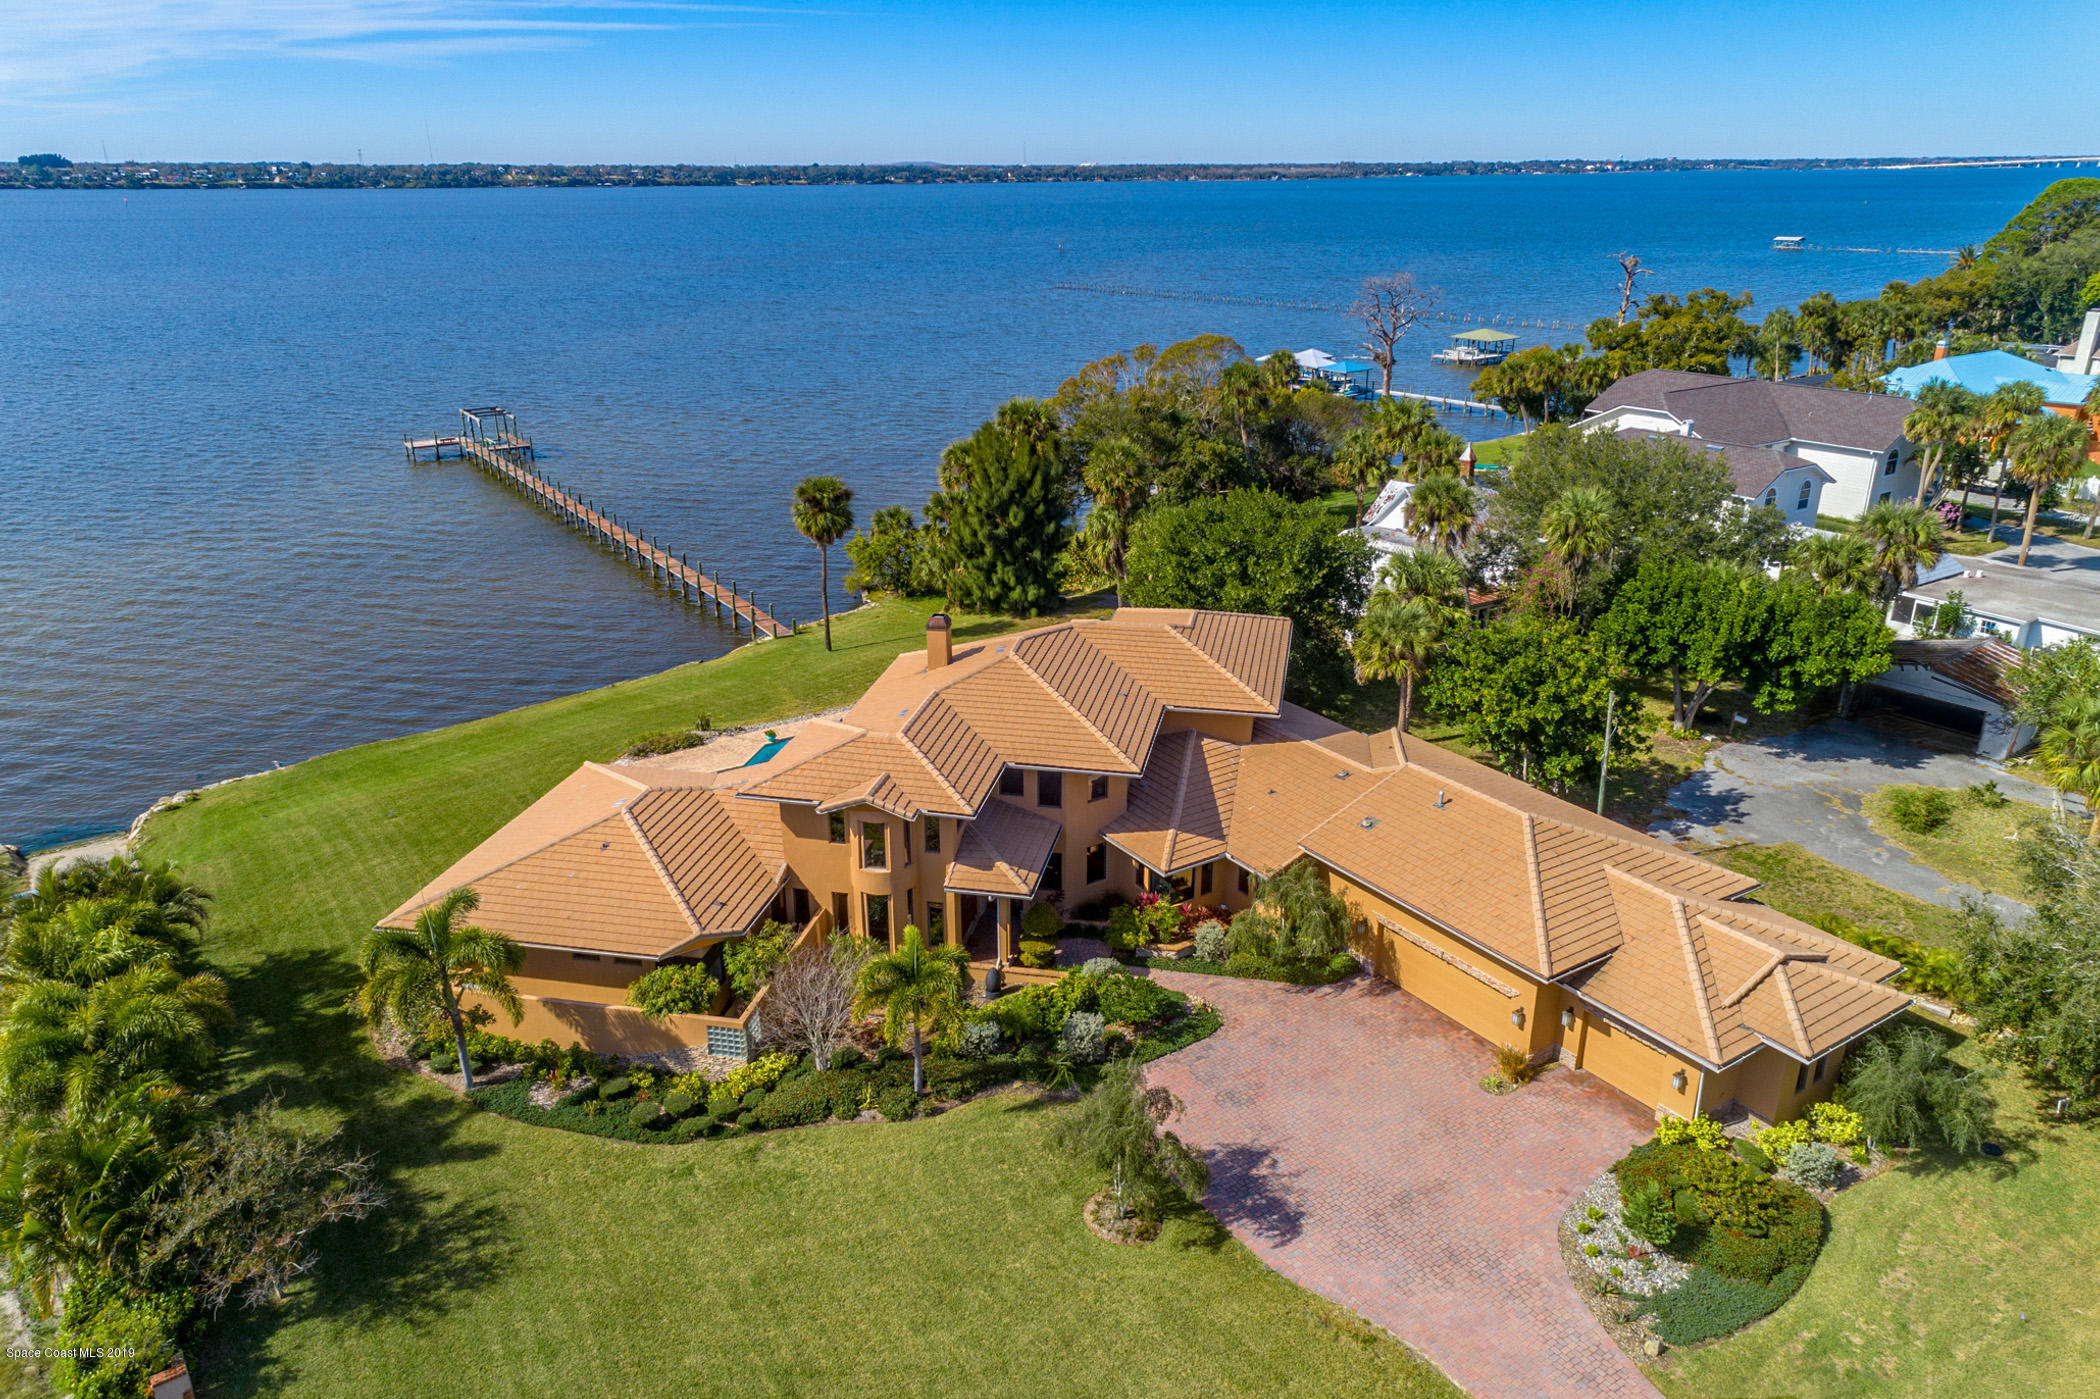 Single Family Homes for Sale at 500 Snug Harbor Merritt Island, Florida 32953 United States